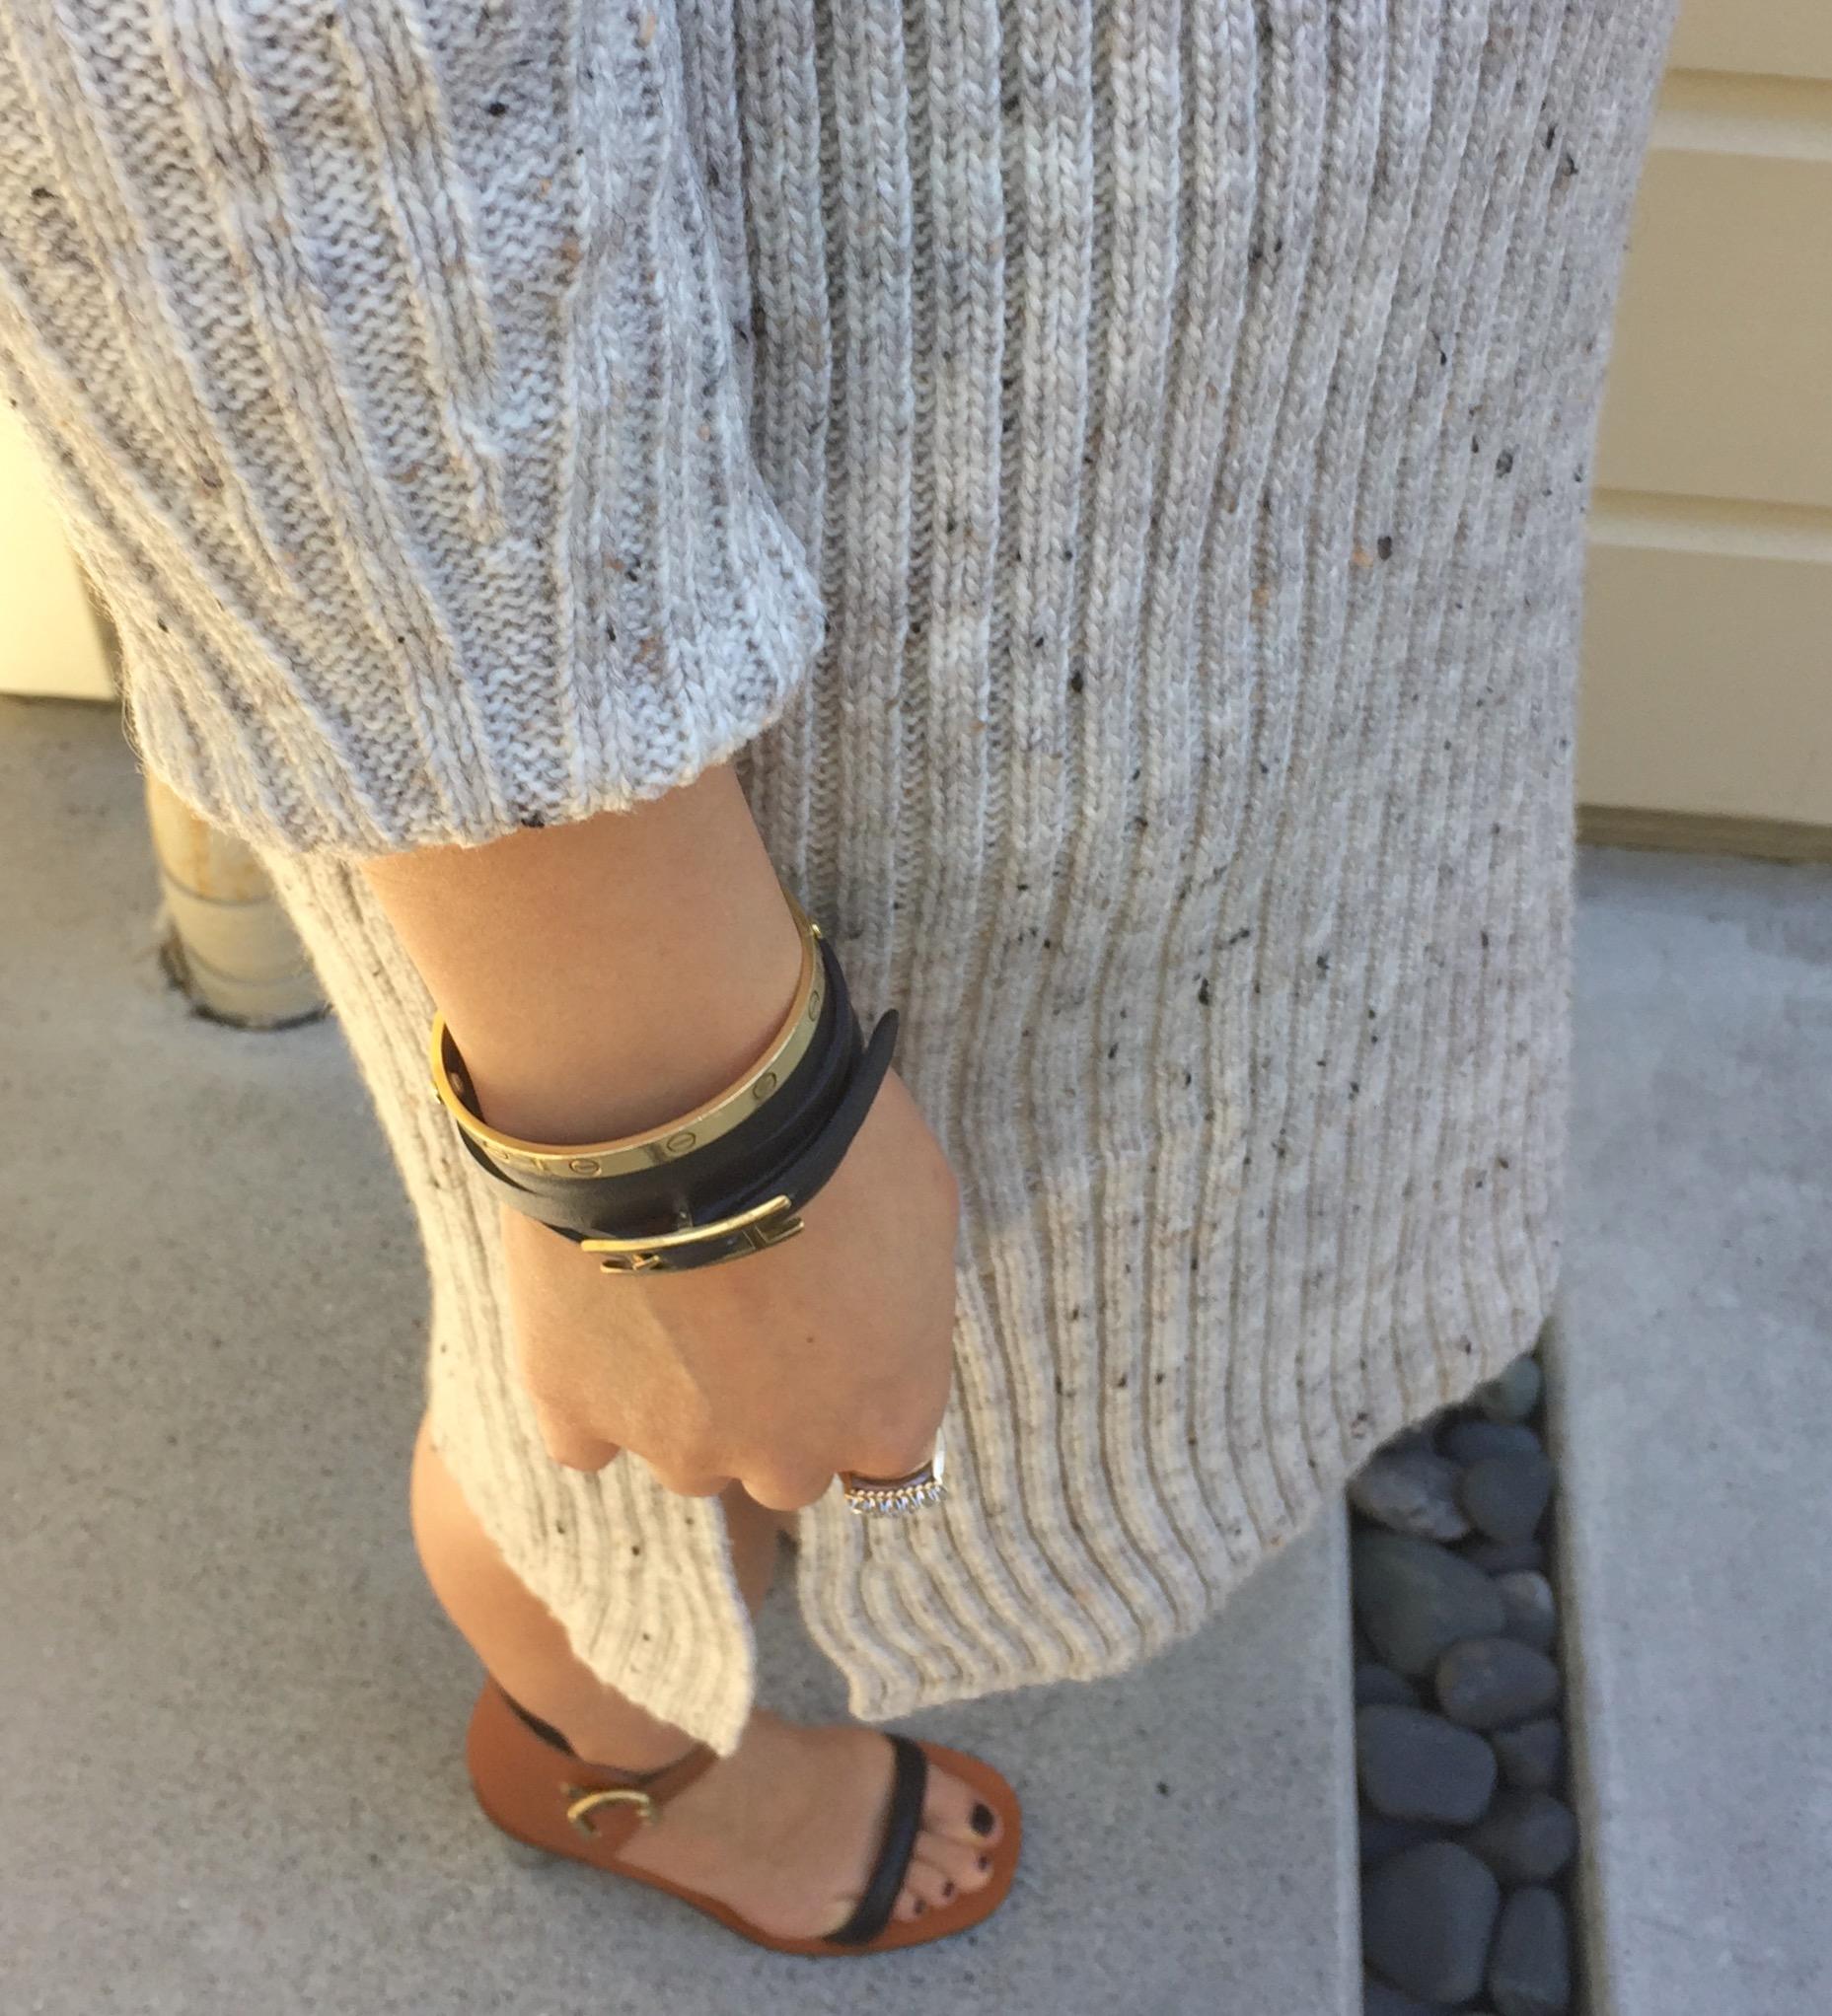 d8e3142c ... goyard bag and celine bam bam sandals ribbed sweater dress details ...